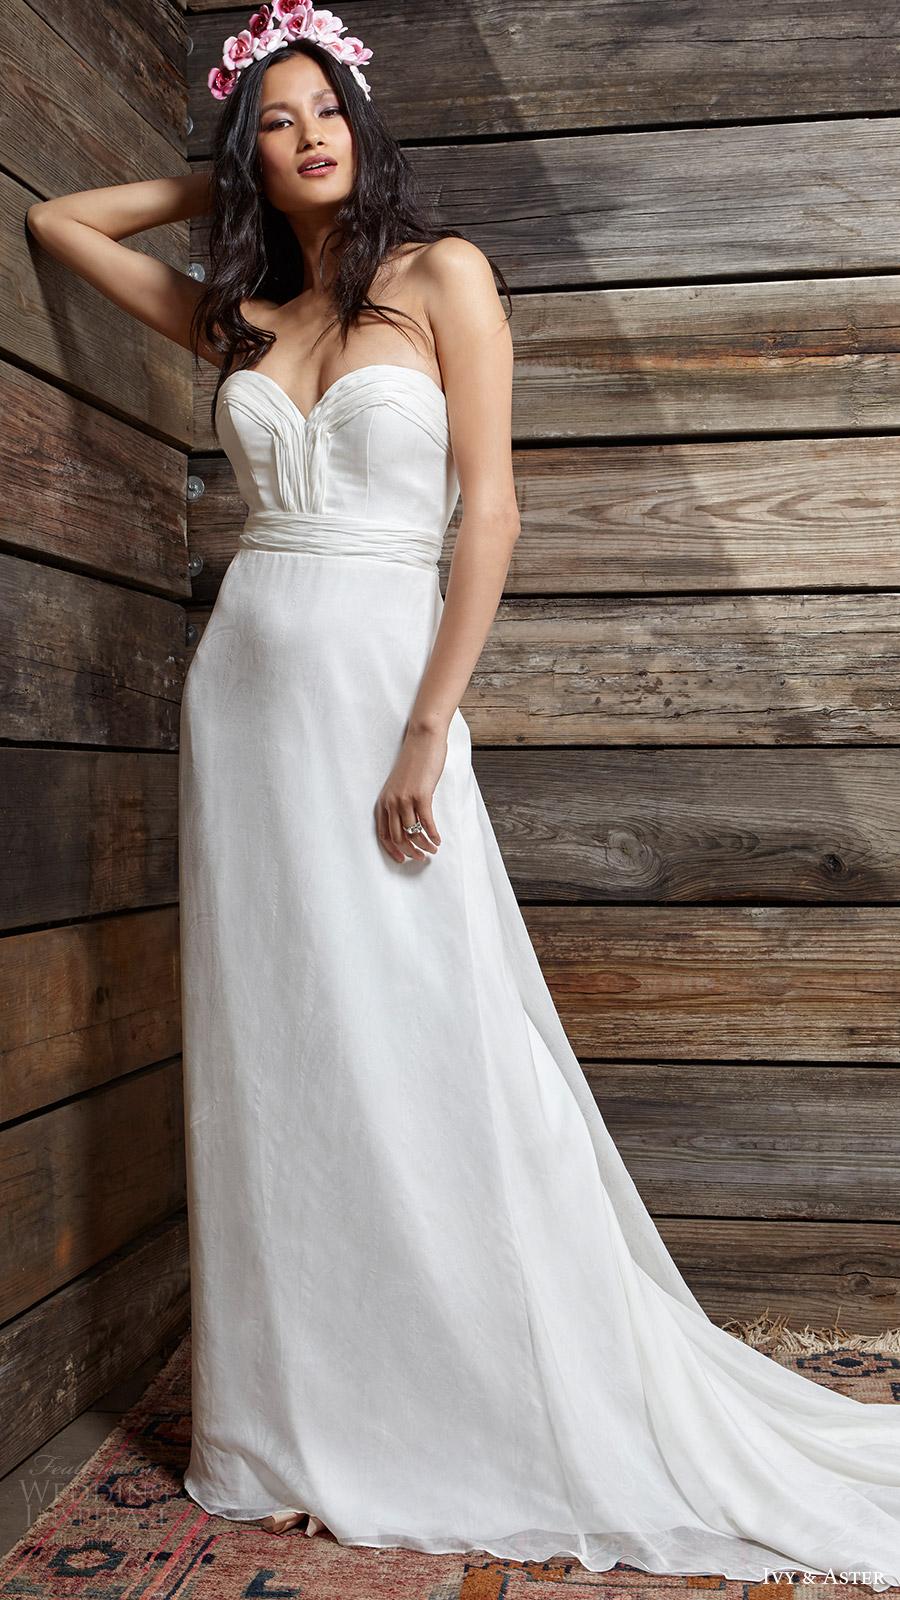 ivy aster bridal spring 2017 strapless sweetheart aline wedding dress (amelie) mv